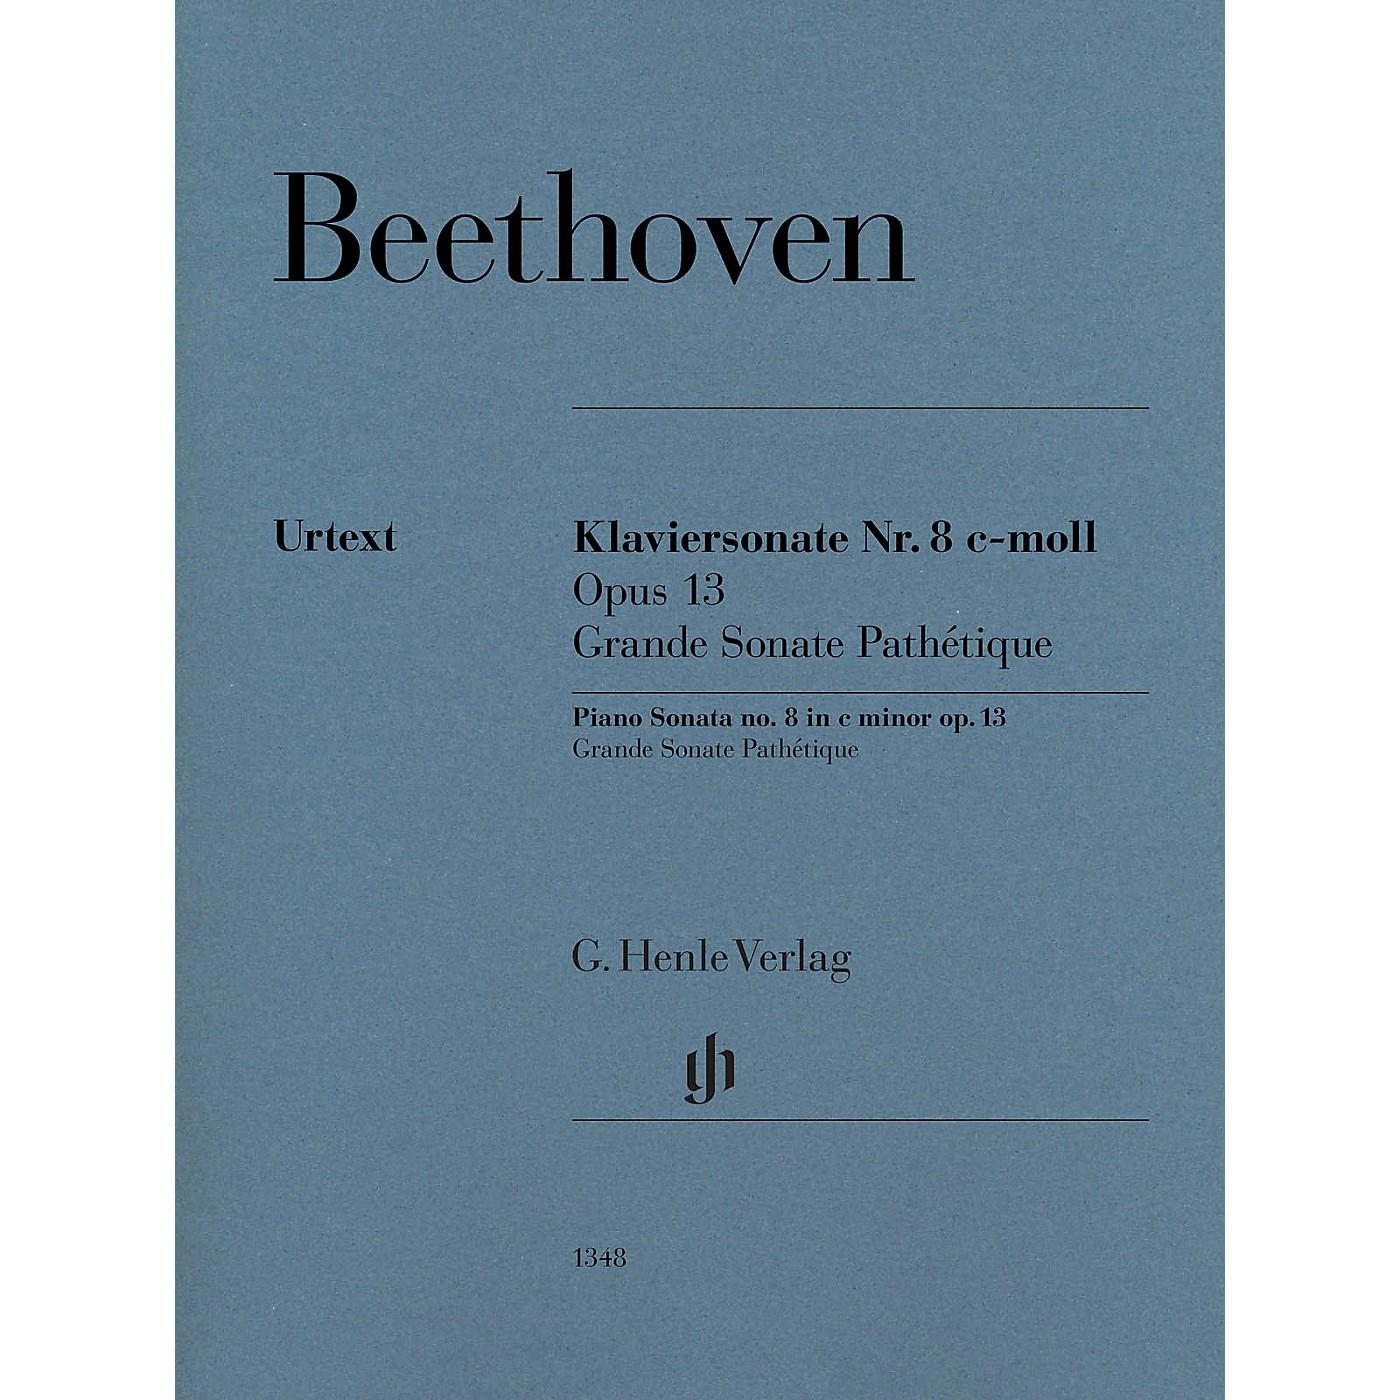 G. Henle Verlag Piano Sonata No. 8 in C Minor, Op. 13 (Grande Sonata Pathétique) by Beethoven thumbnail